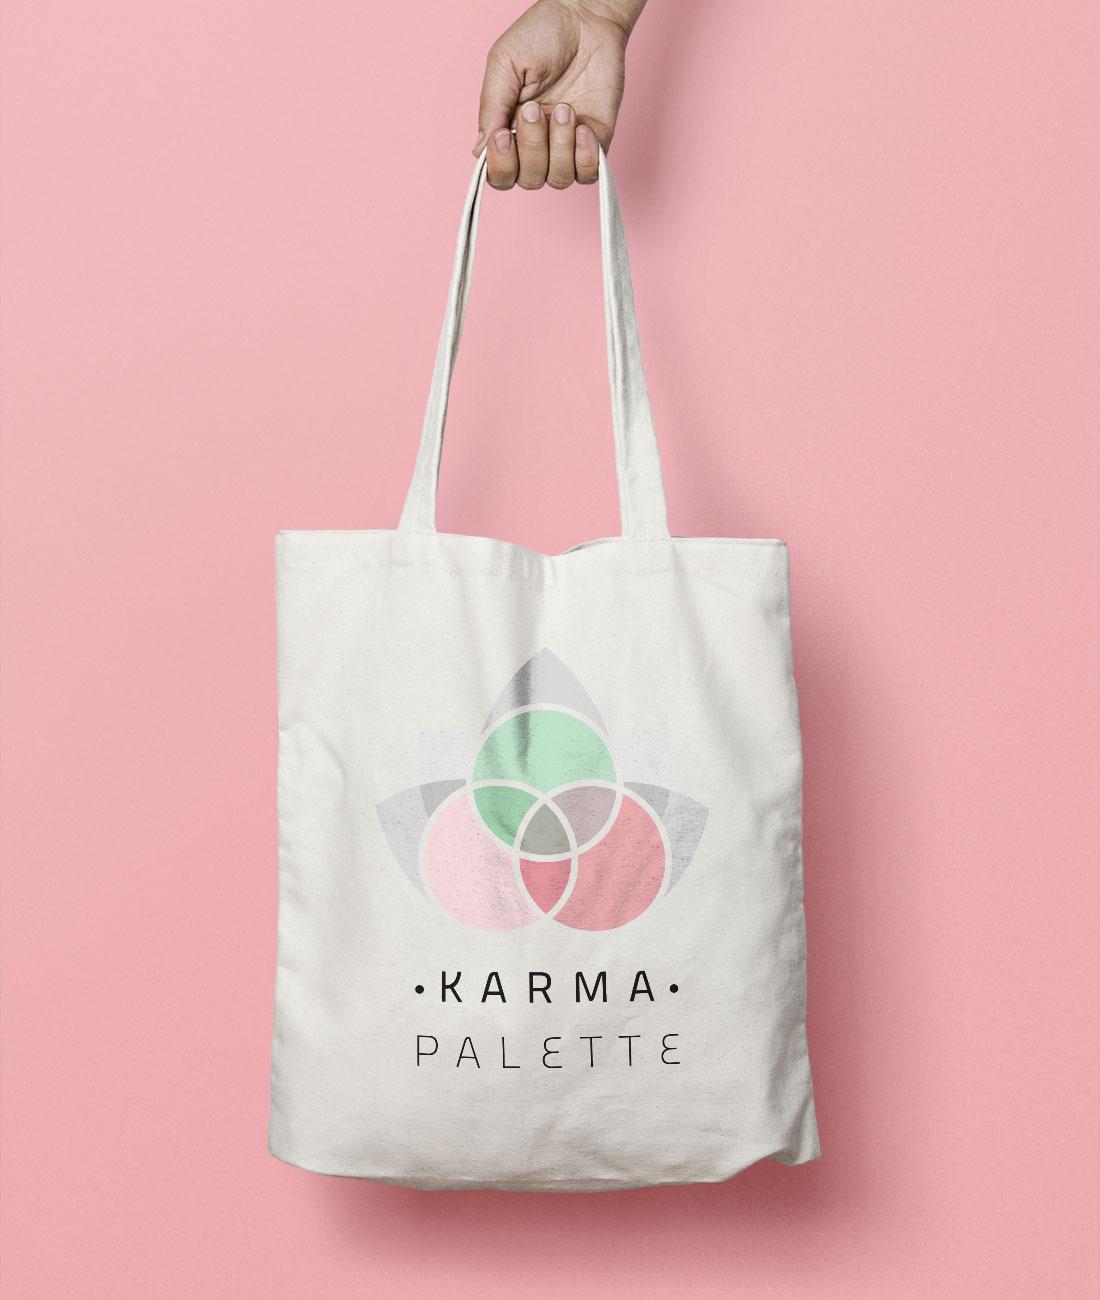 Karma-Palette7-marielleloussot